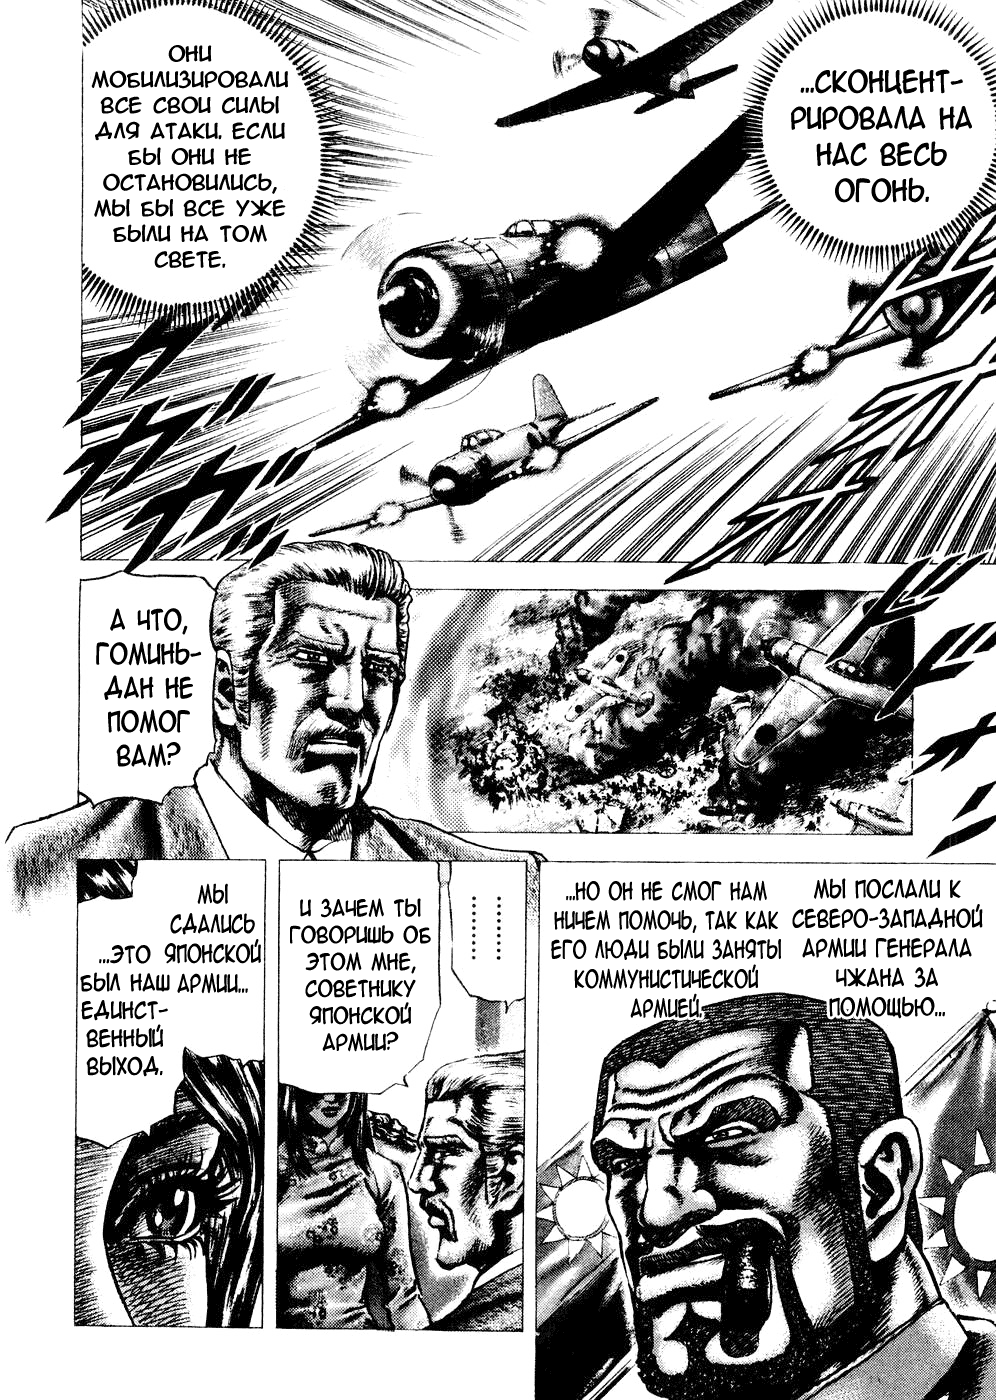 https://r1.ninemanga.com/comics/pic2/6/29190/292249/1461595061219.jpg Page 4